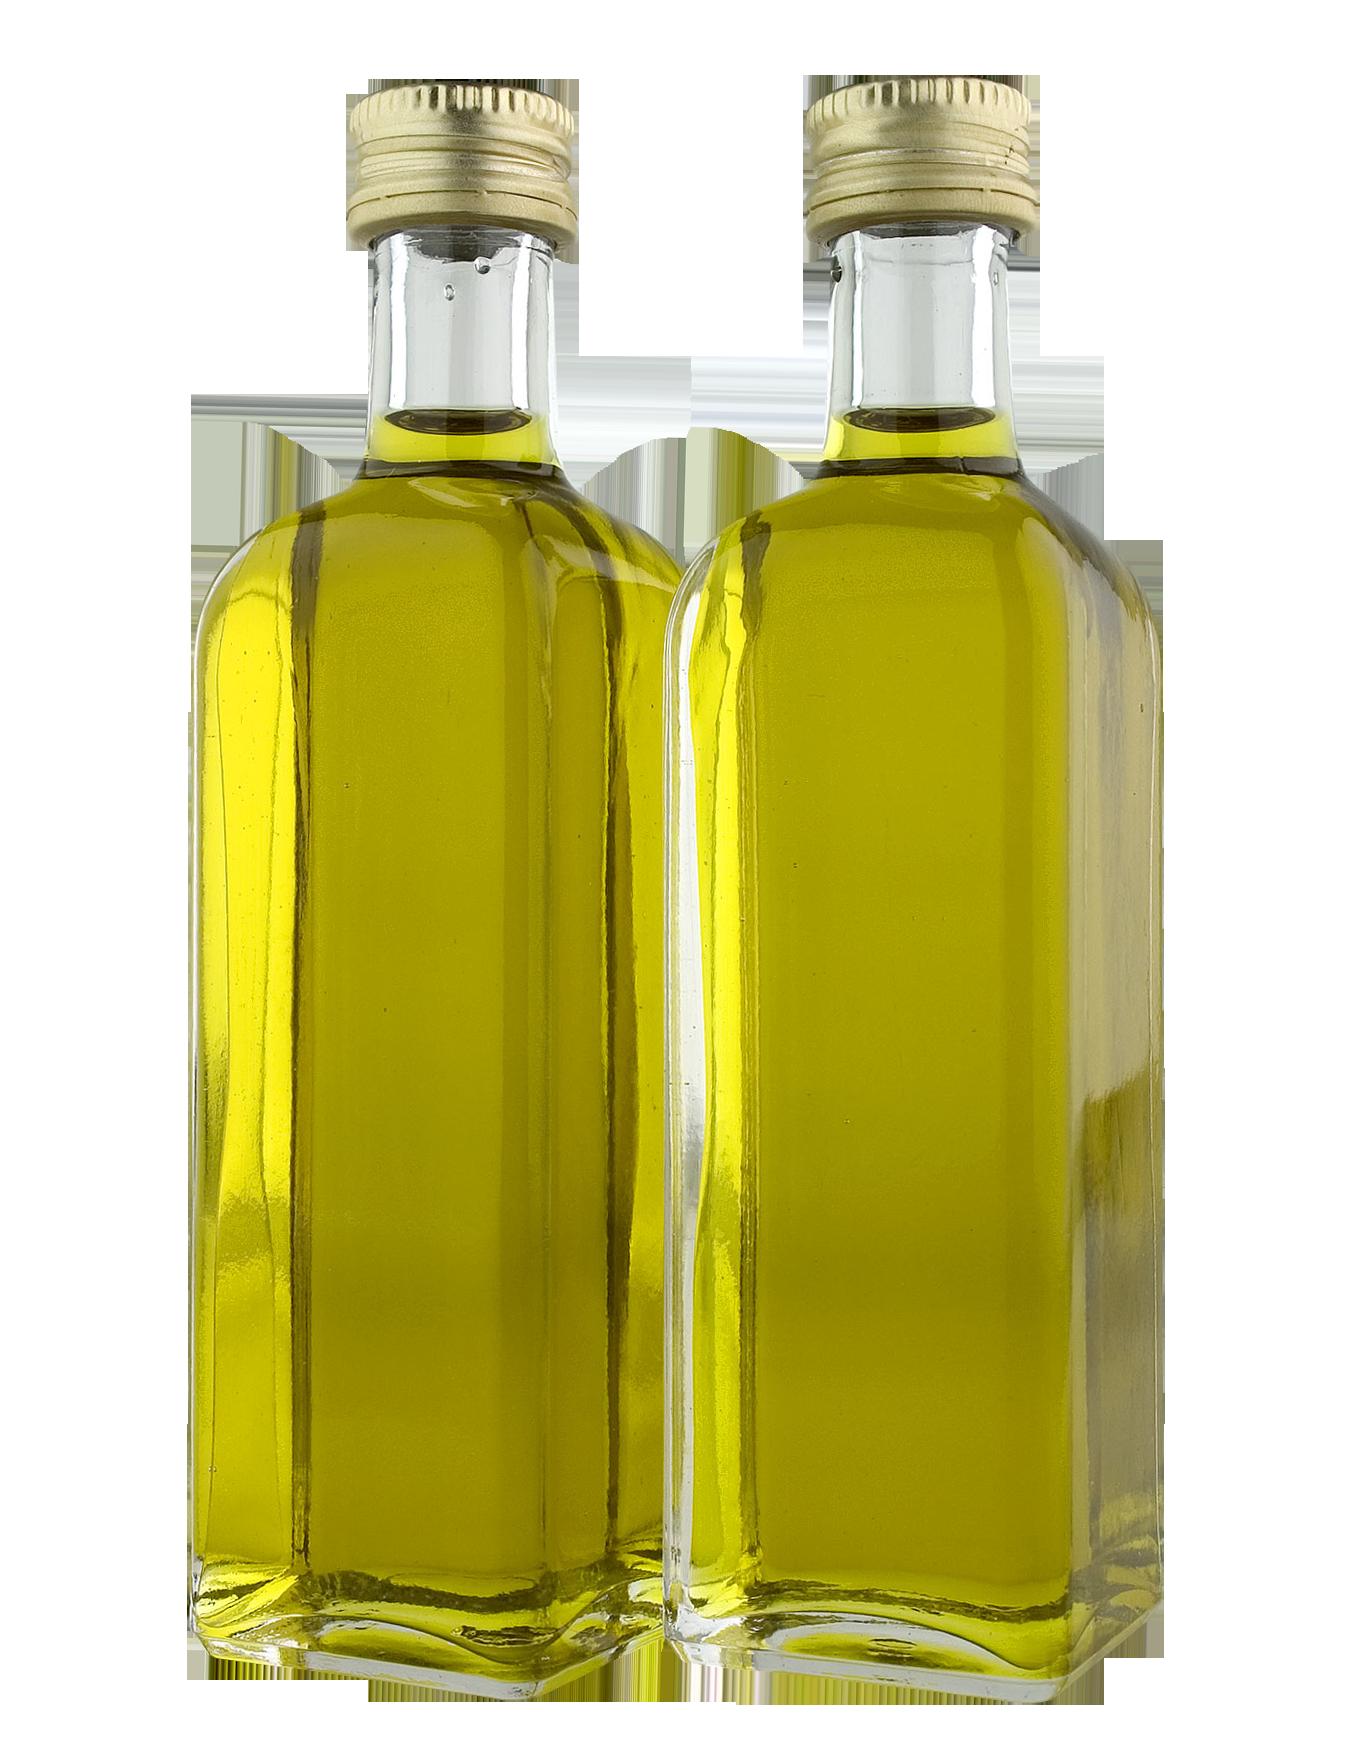 Olive Oil Bottle Relaxed Hair Productos Naturales Para El Cabello Aceite Para El Cabello